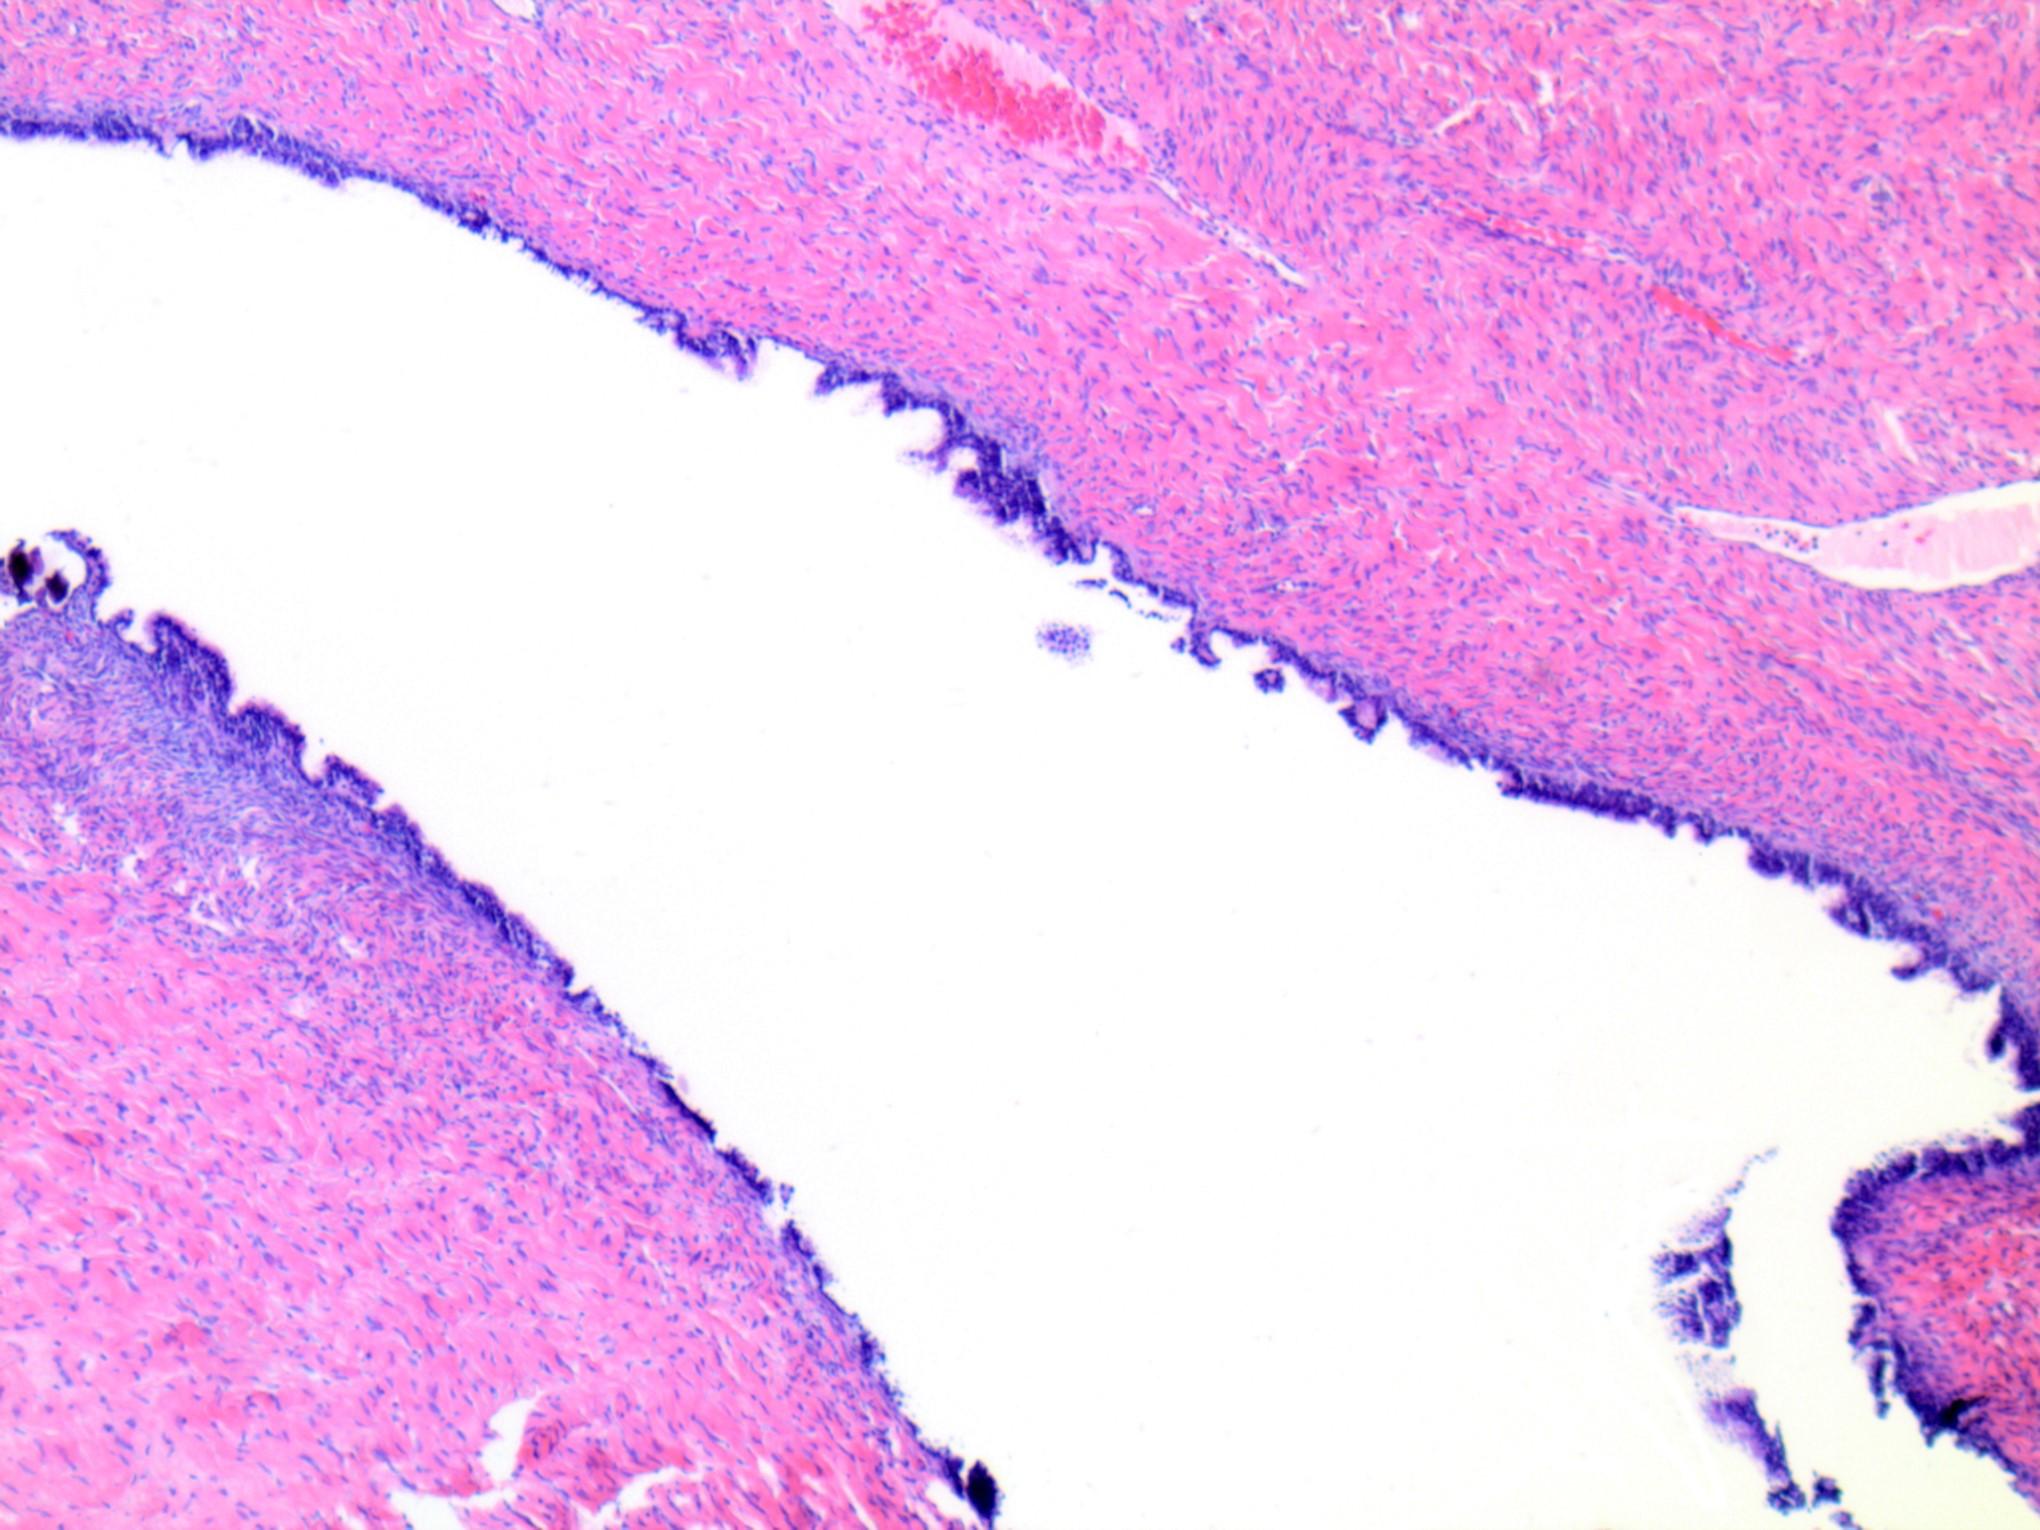 Serous cystadenofibroma